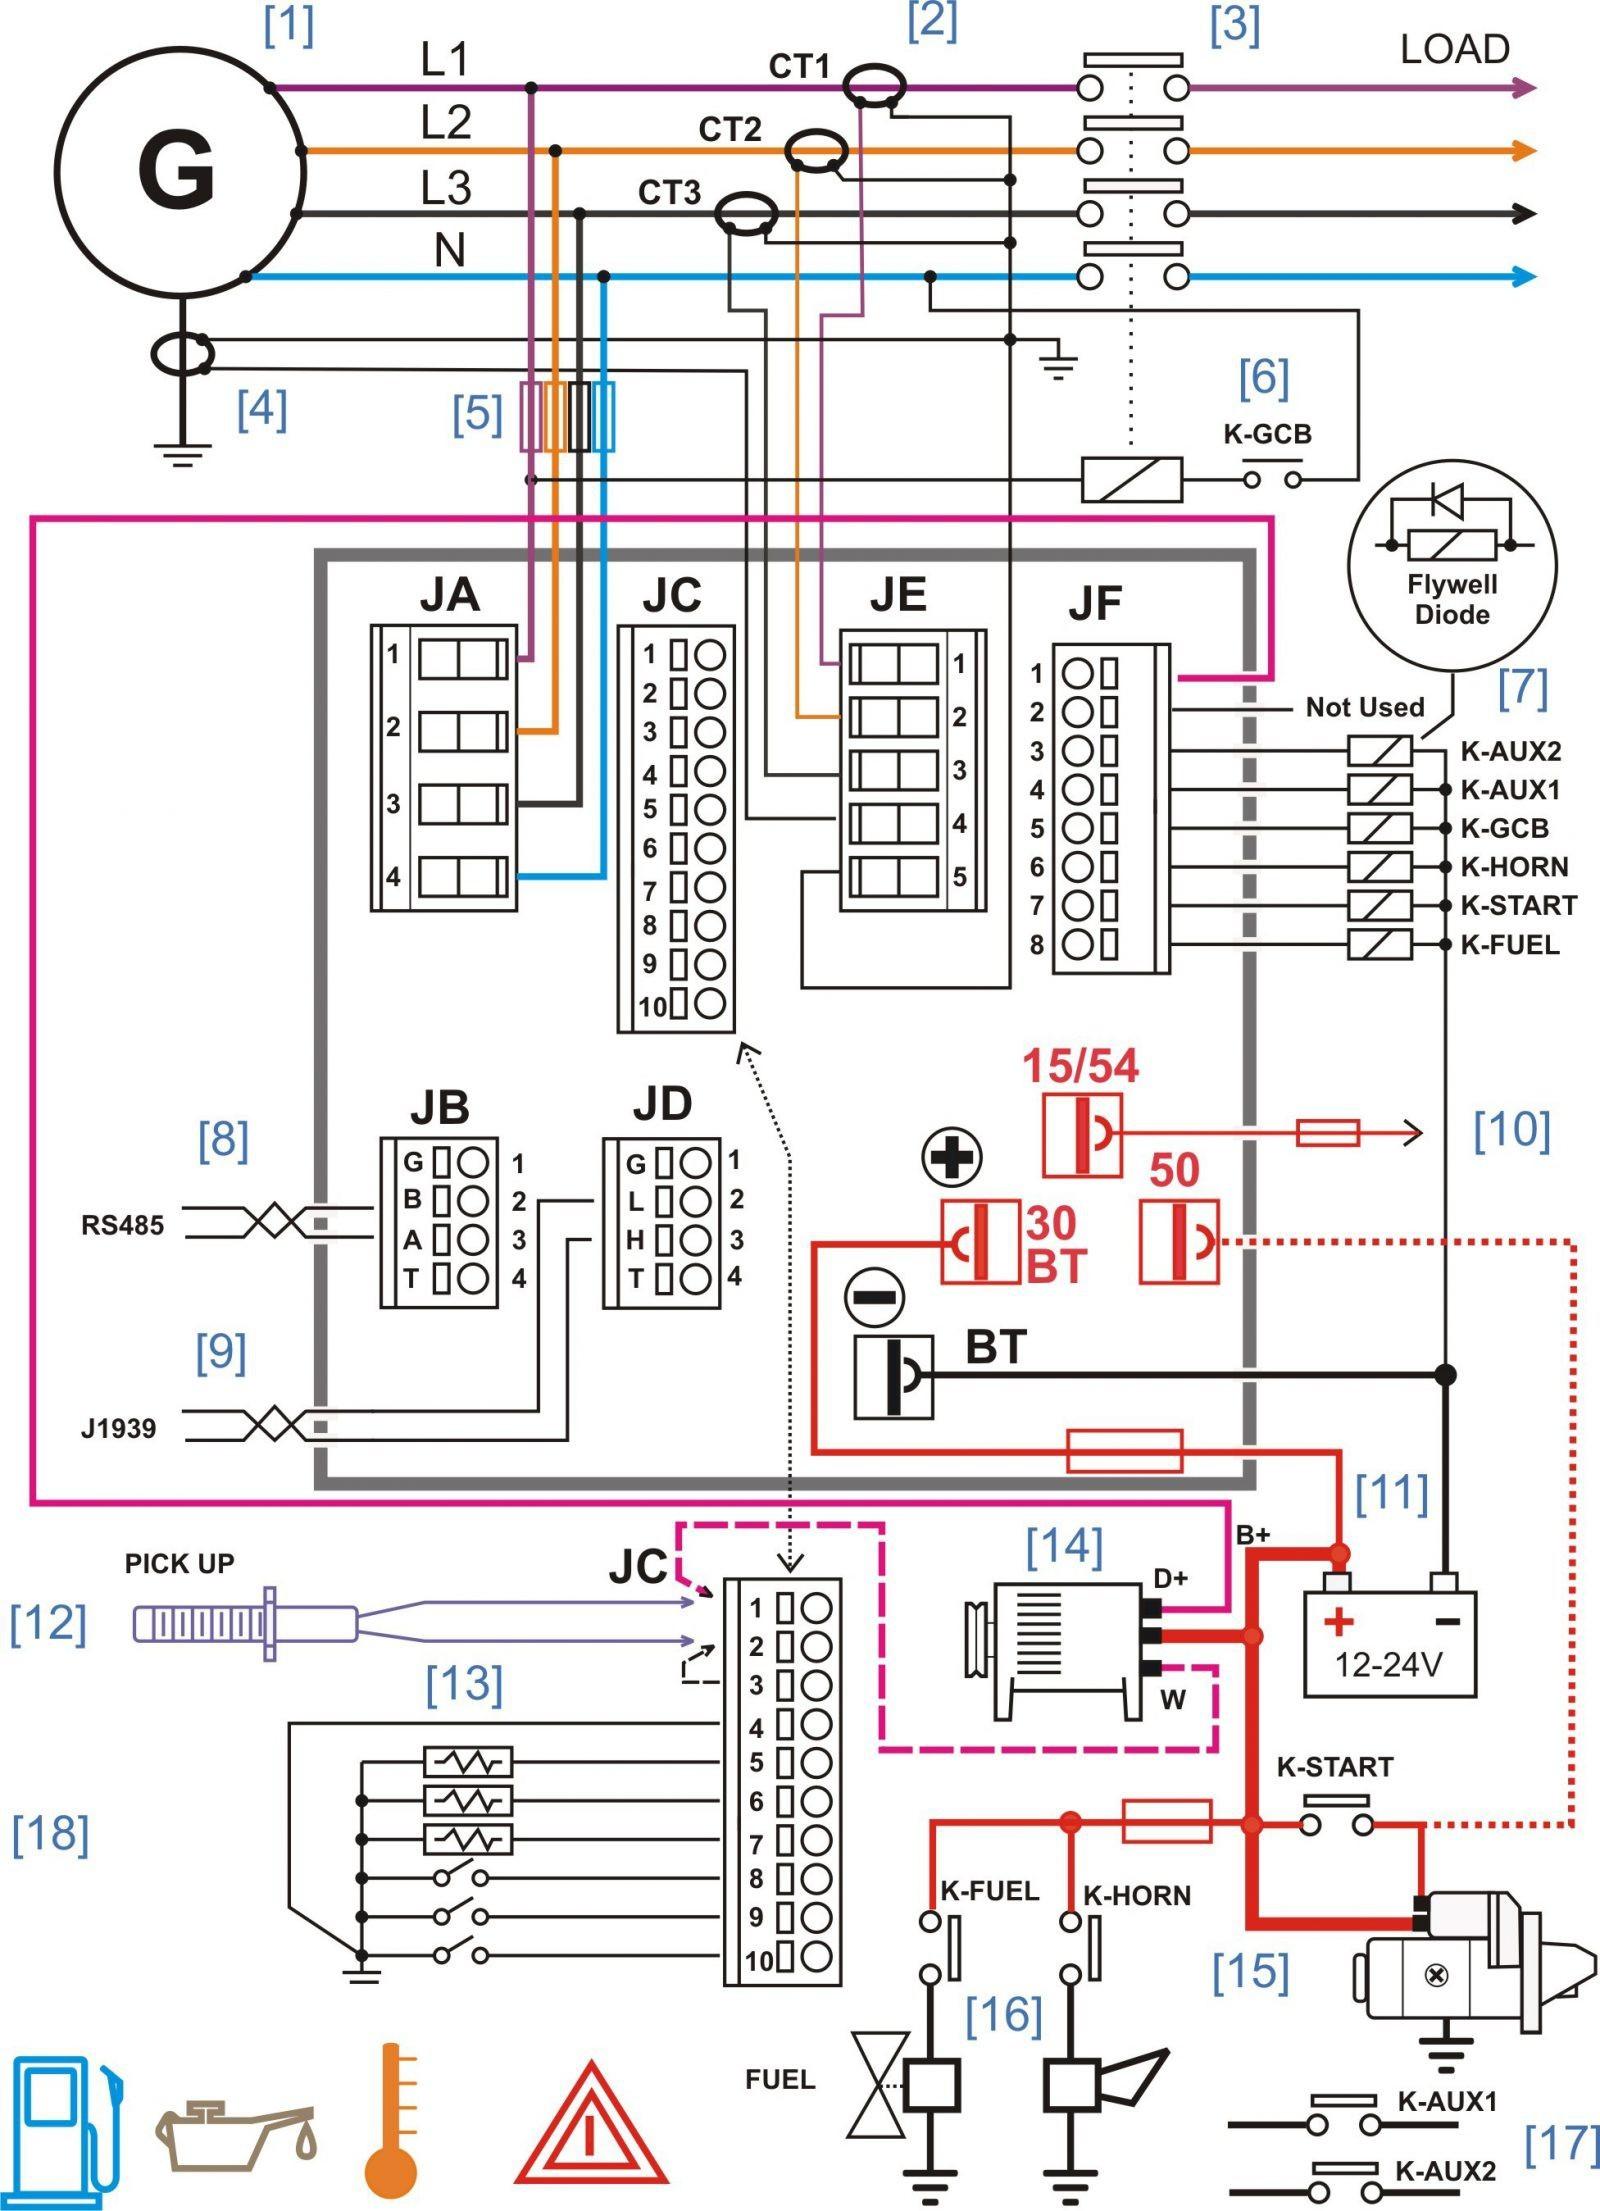 delphi 28173908 radio wiring diagram circuit wiring and diagram hub \u2022 3-way switch wiring diagram delphi 28173908 radio wiring diagram images gallery